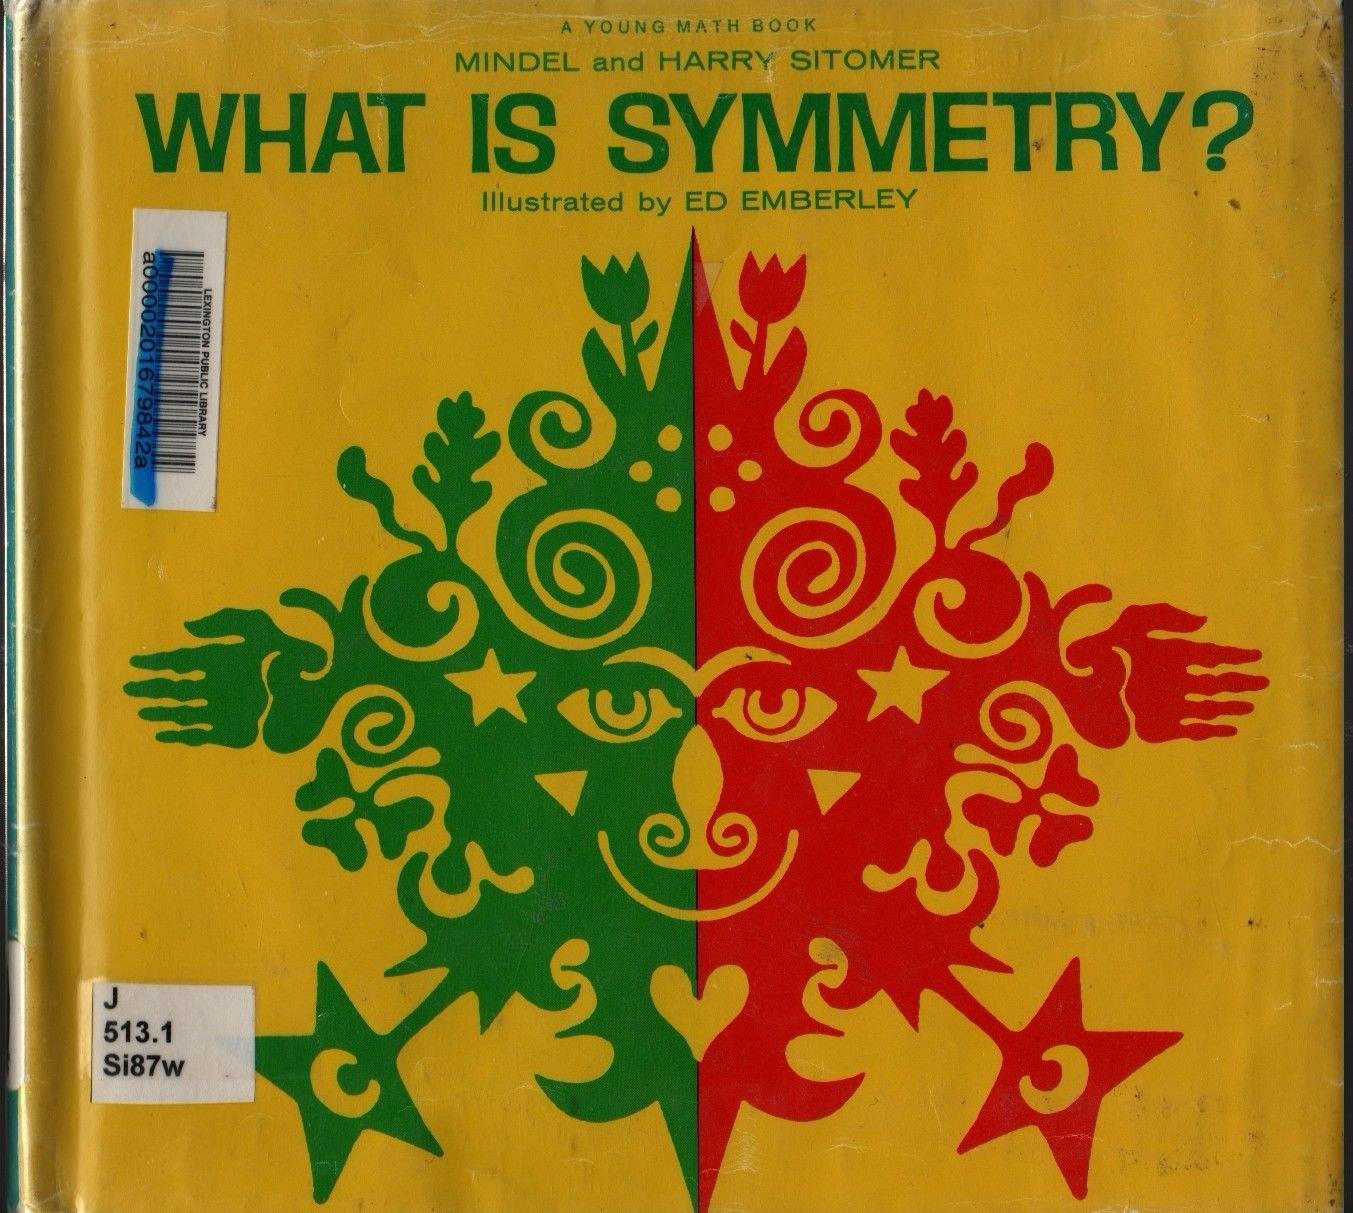 What Is Symmetry? + First Printing + Sitomer + Ed Emberley + 1970 + Vintage Kids